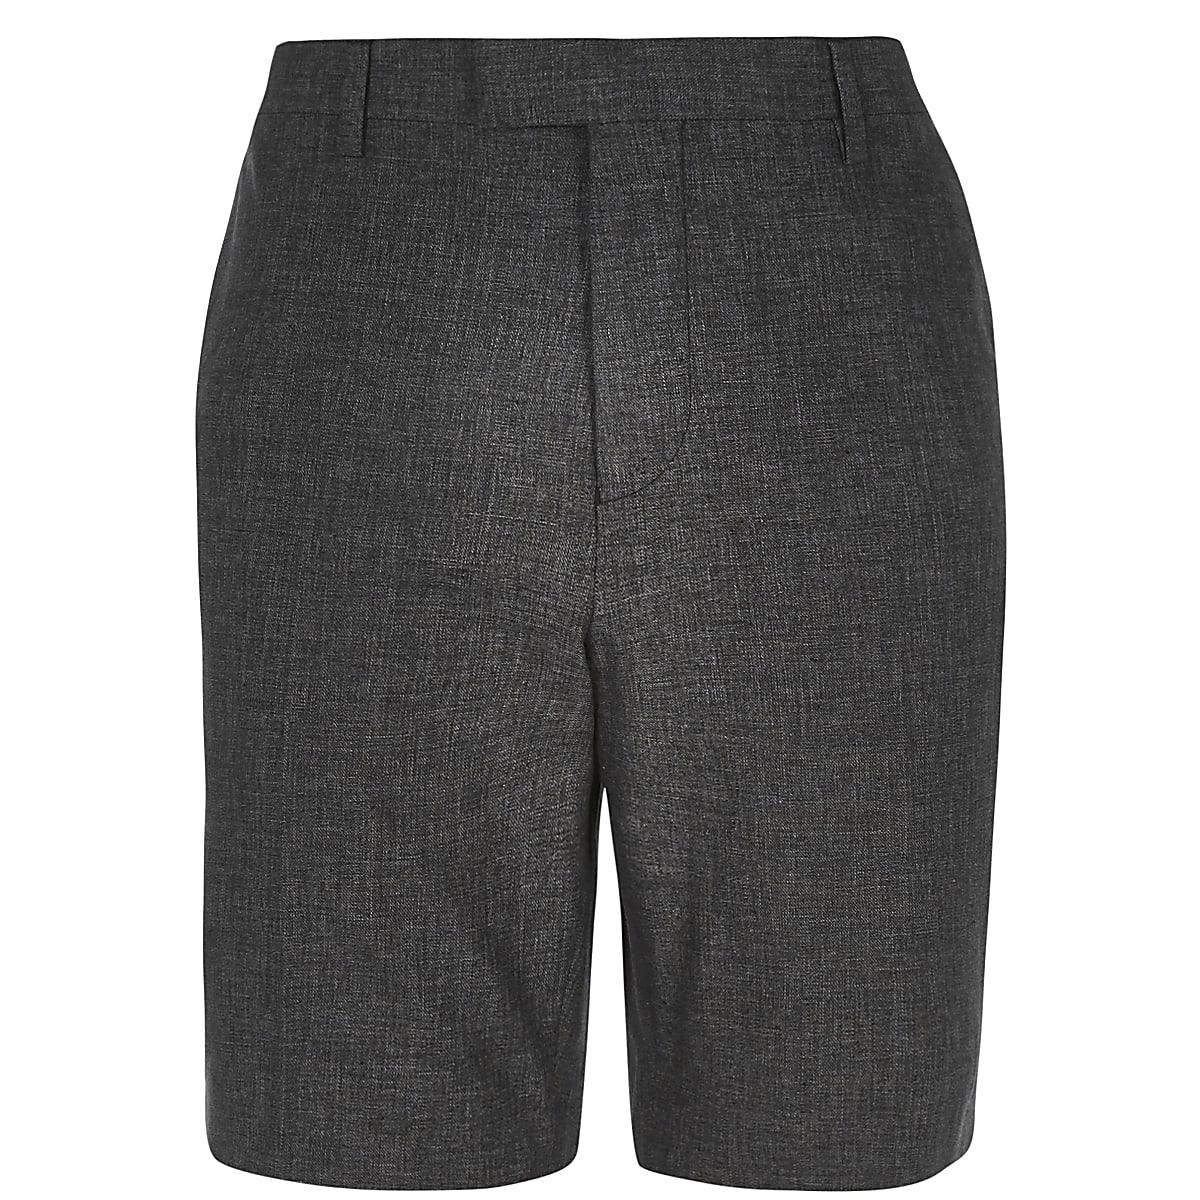 Black linen tailored shorts